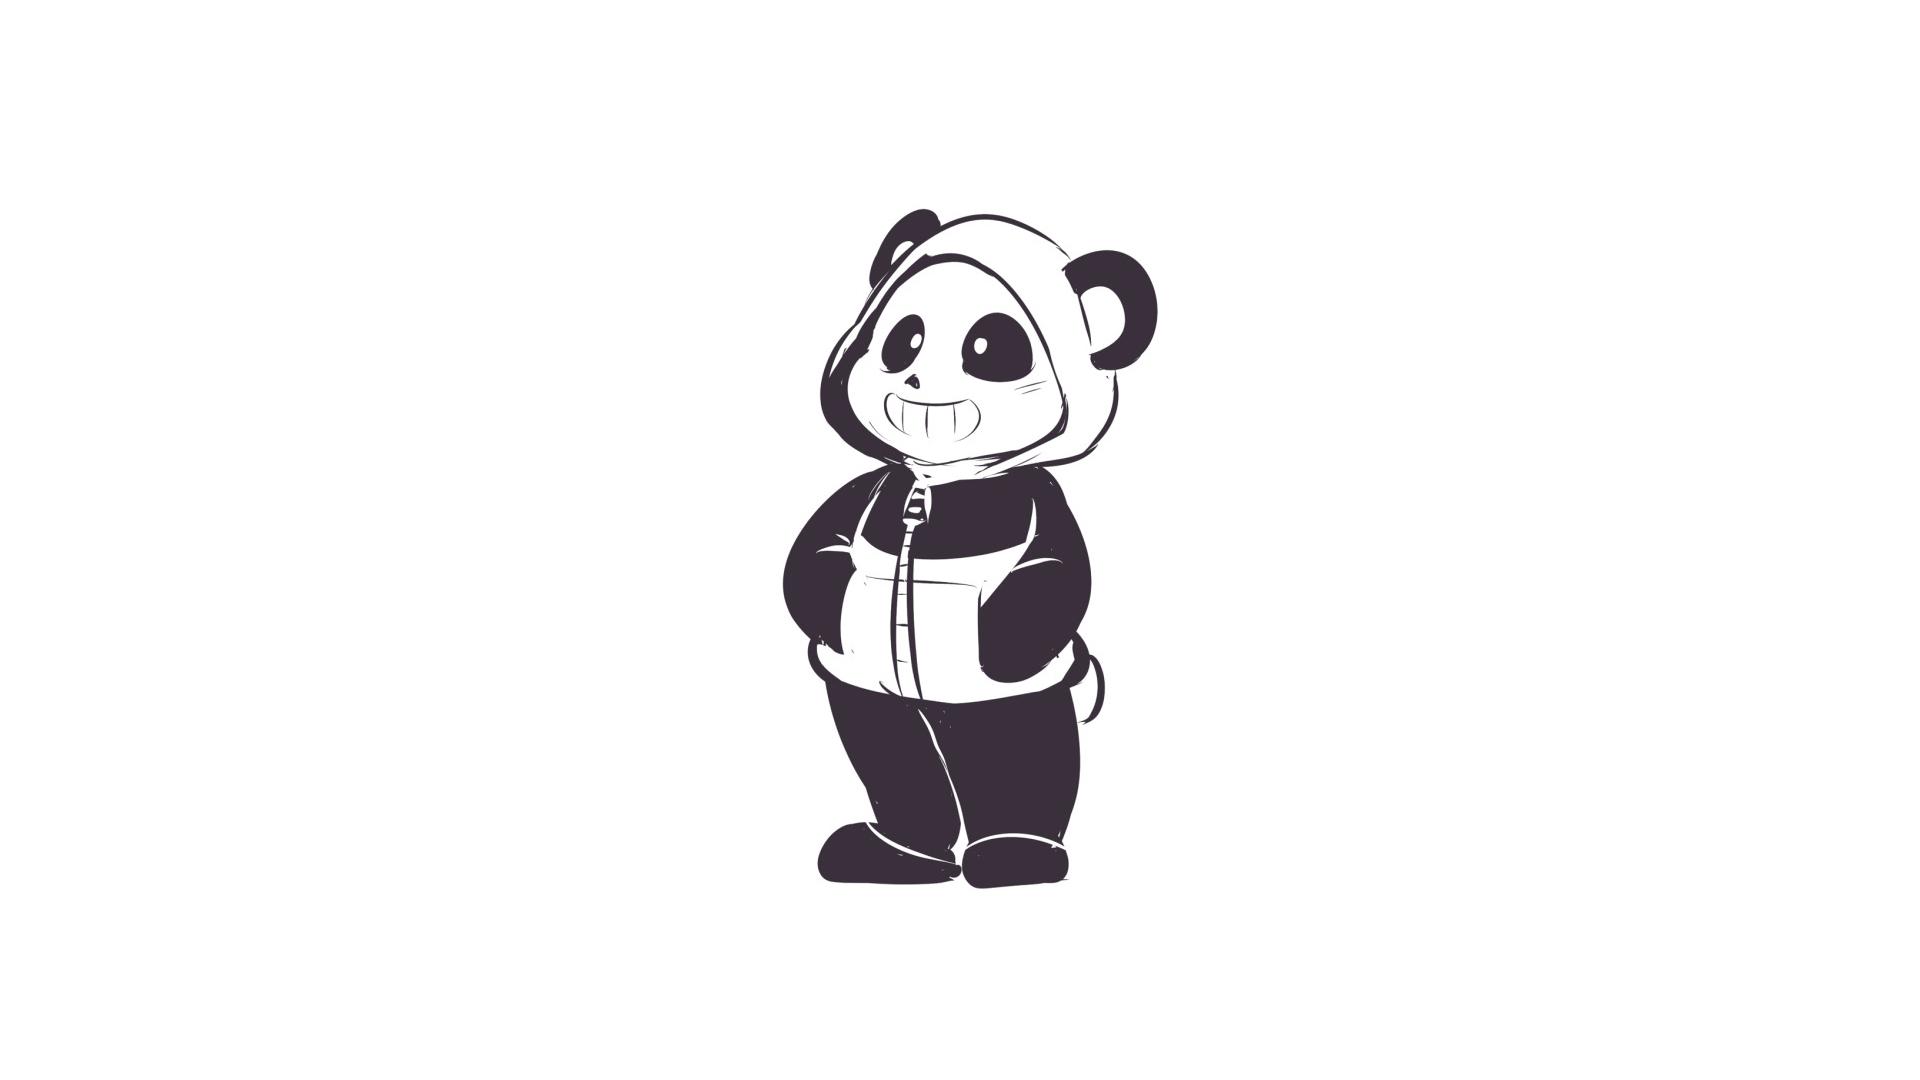 Undertale Panda Sans wallpaper happy panda wallpaper hoodie sketch 1920x1080